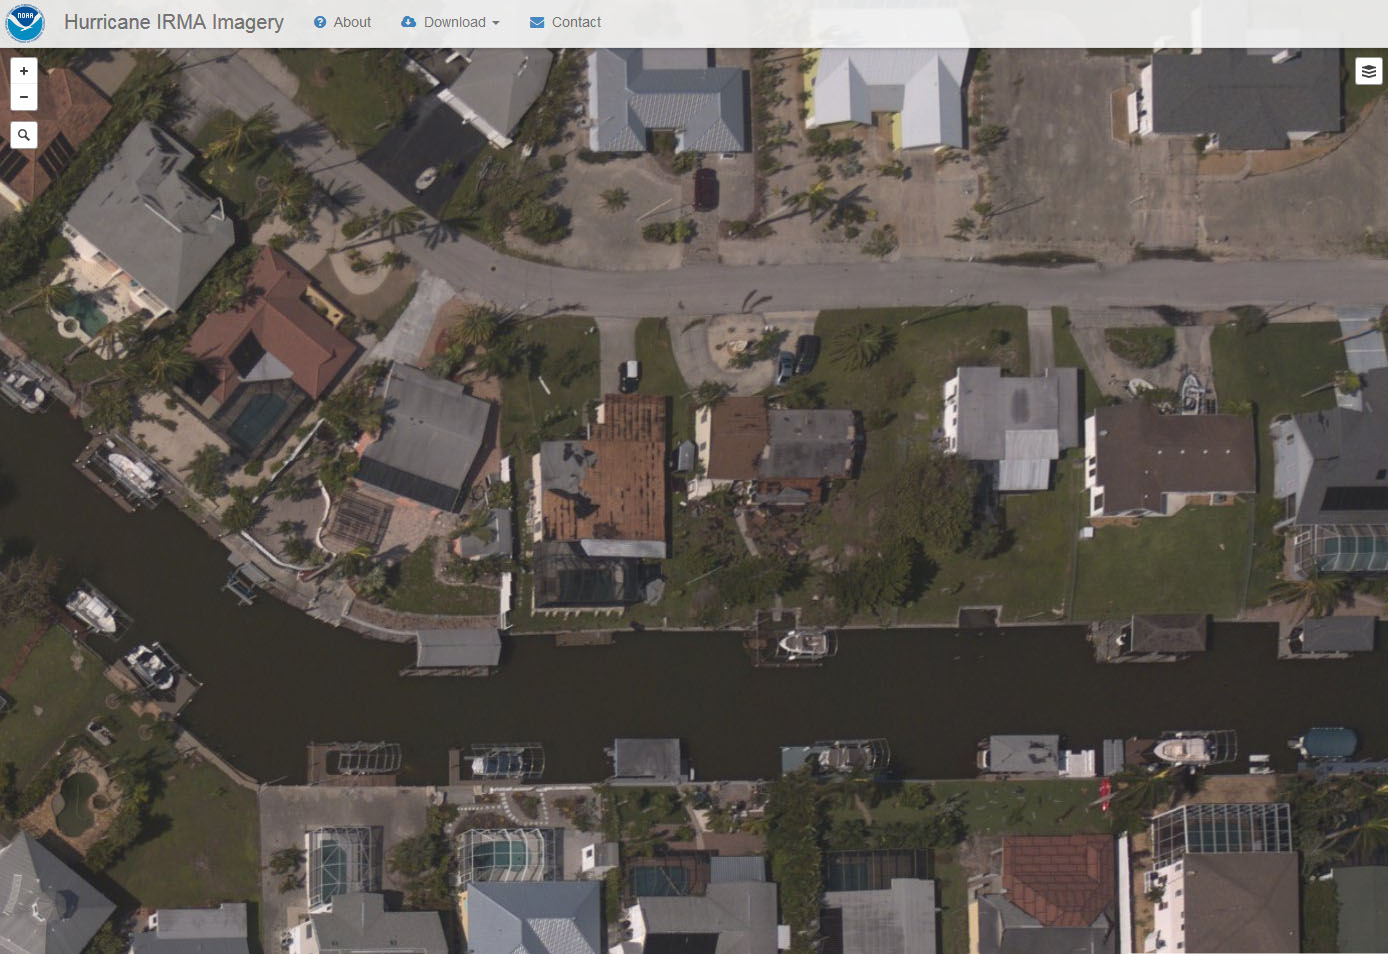 NOAA Irma aftermath aerial in Florida